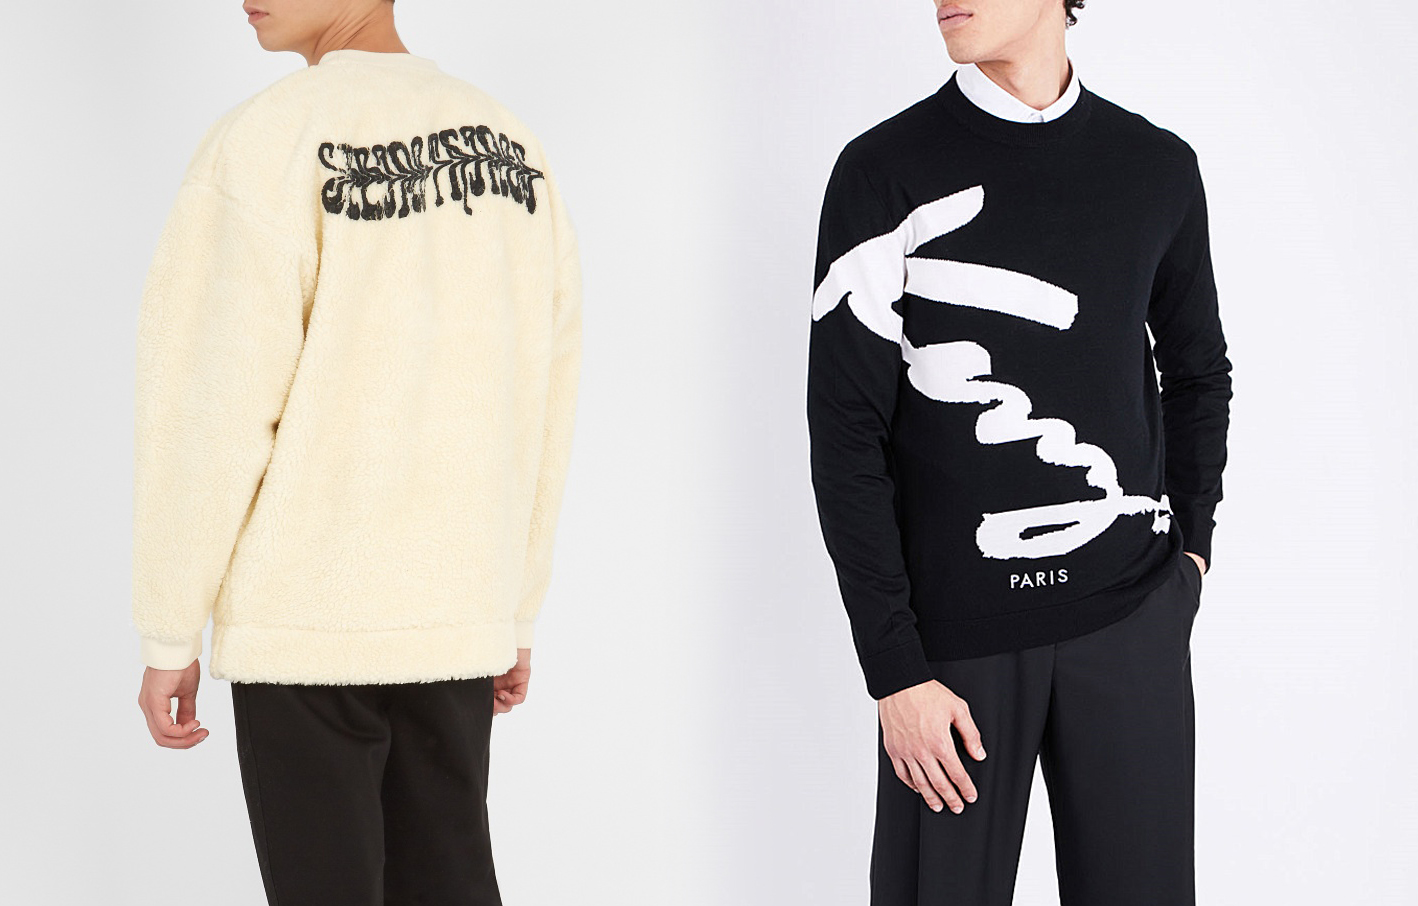 PAUSE Picks: 10 Sweatshirts To Buy Now